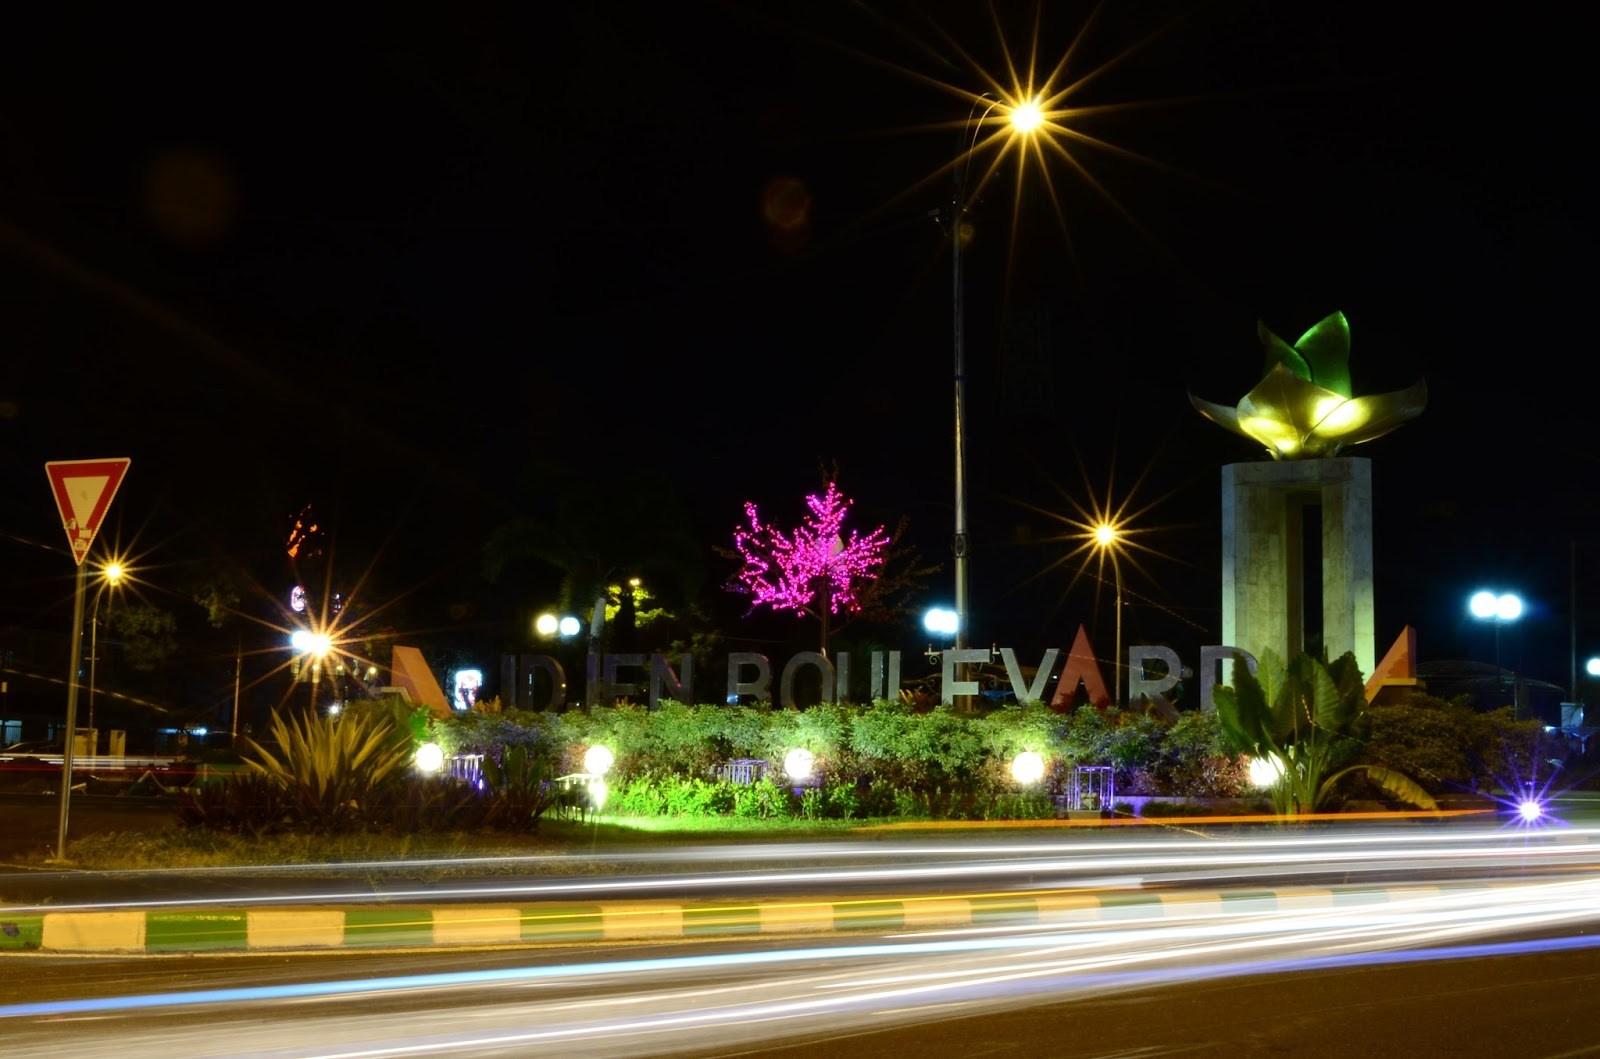 Inilah Sosok Balik Kecantikan Jalan Ijen Boulevard Bersejarah Idjen Kab